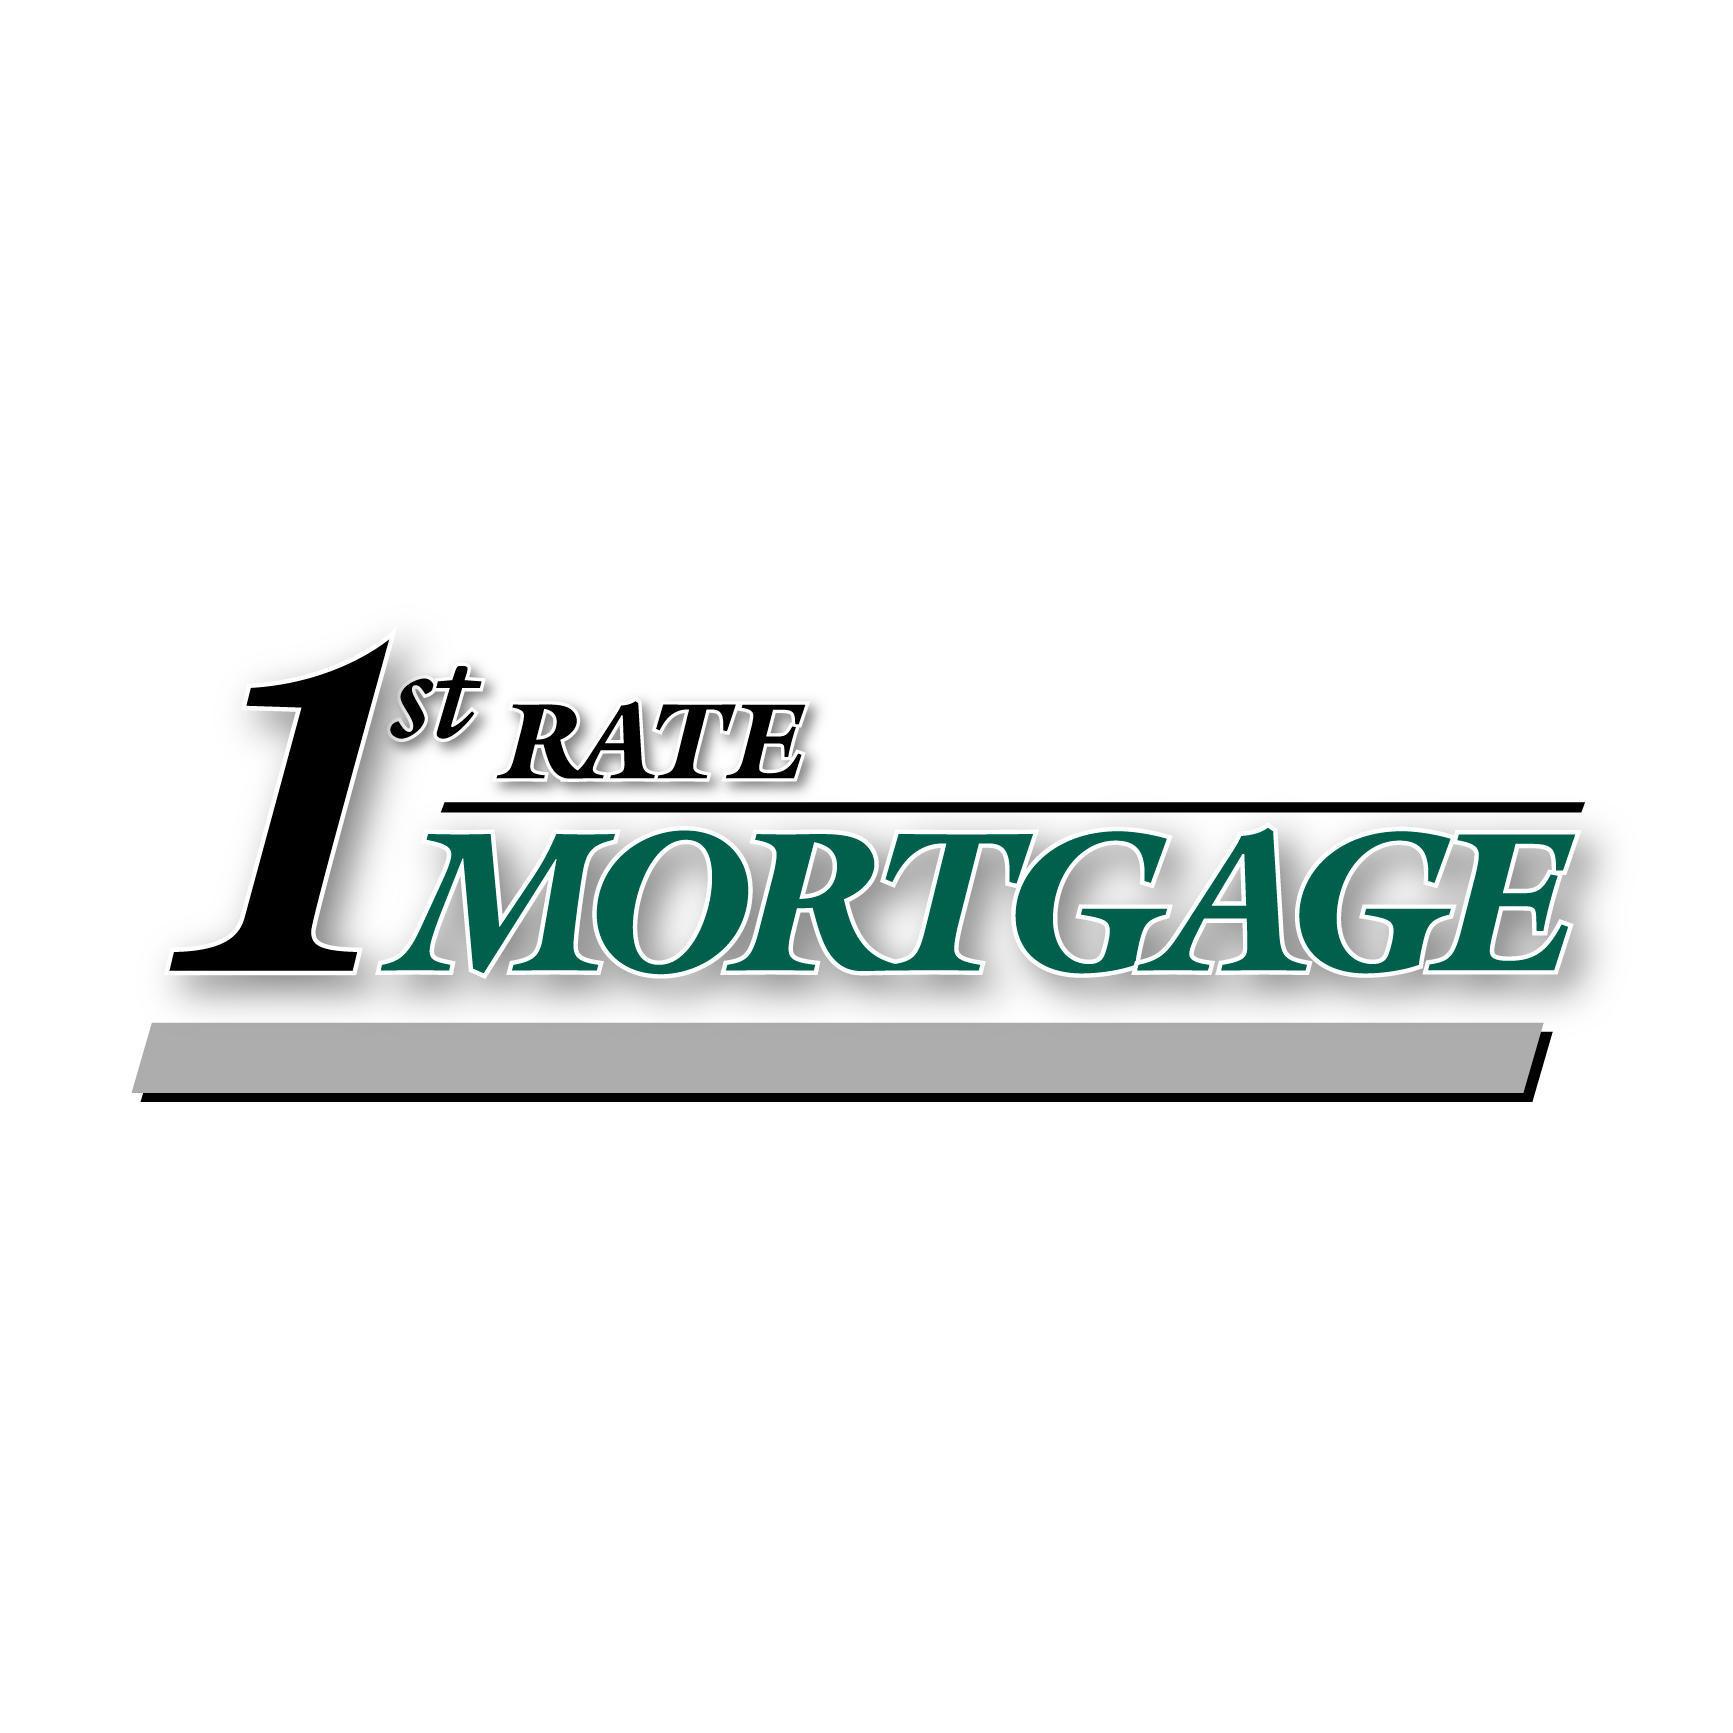 1st Rate Mortgage - Riverton, UT - Mortgage Brokers & Lenders